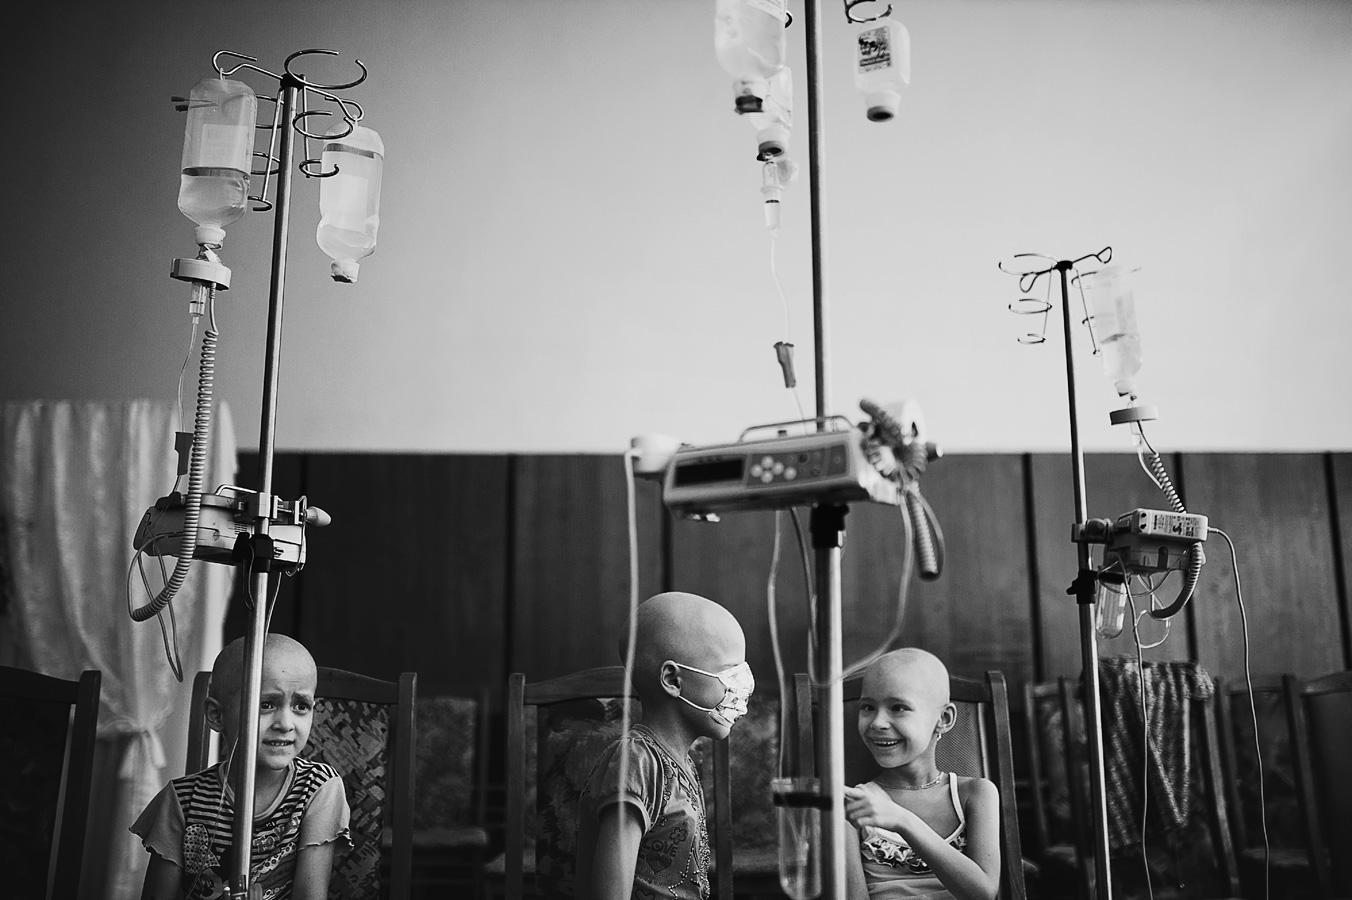 Angels of the Clinic, © Anton Unitsyn, Russian Federation, «The Challenge» Category, 5st prize winner, Hamdan International Photography Award - HIPA